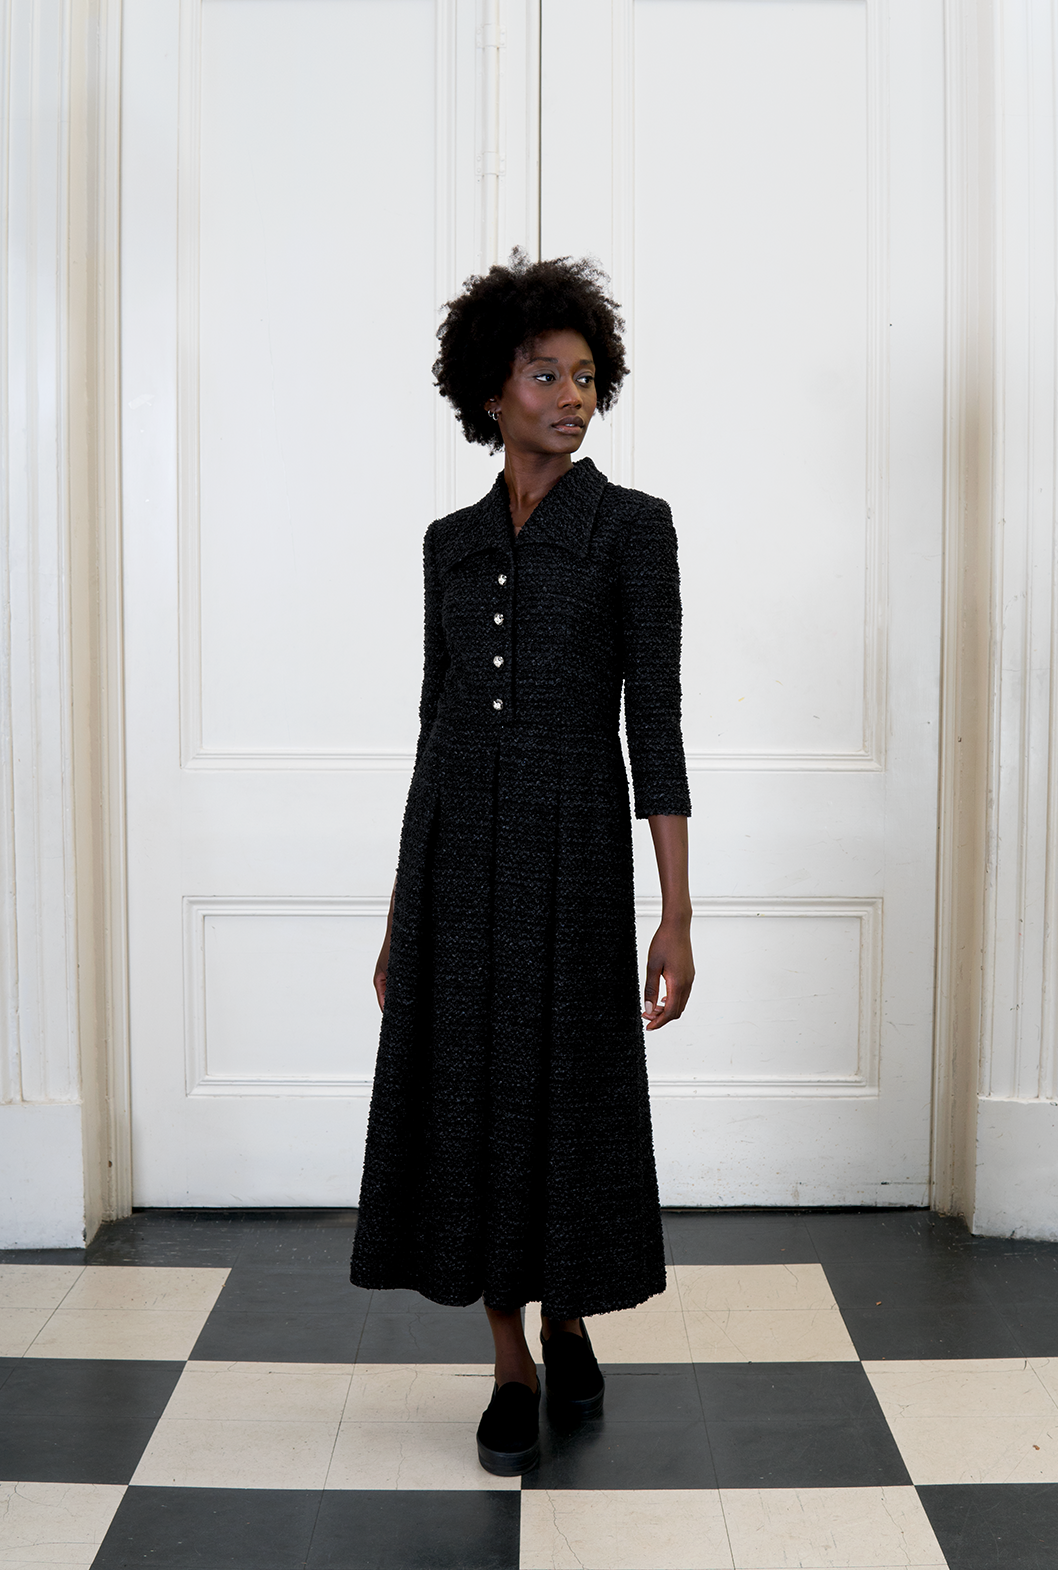 M Black Dress.png